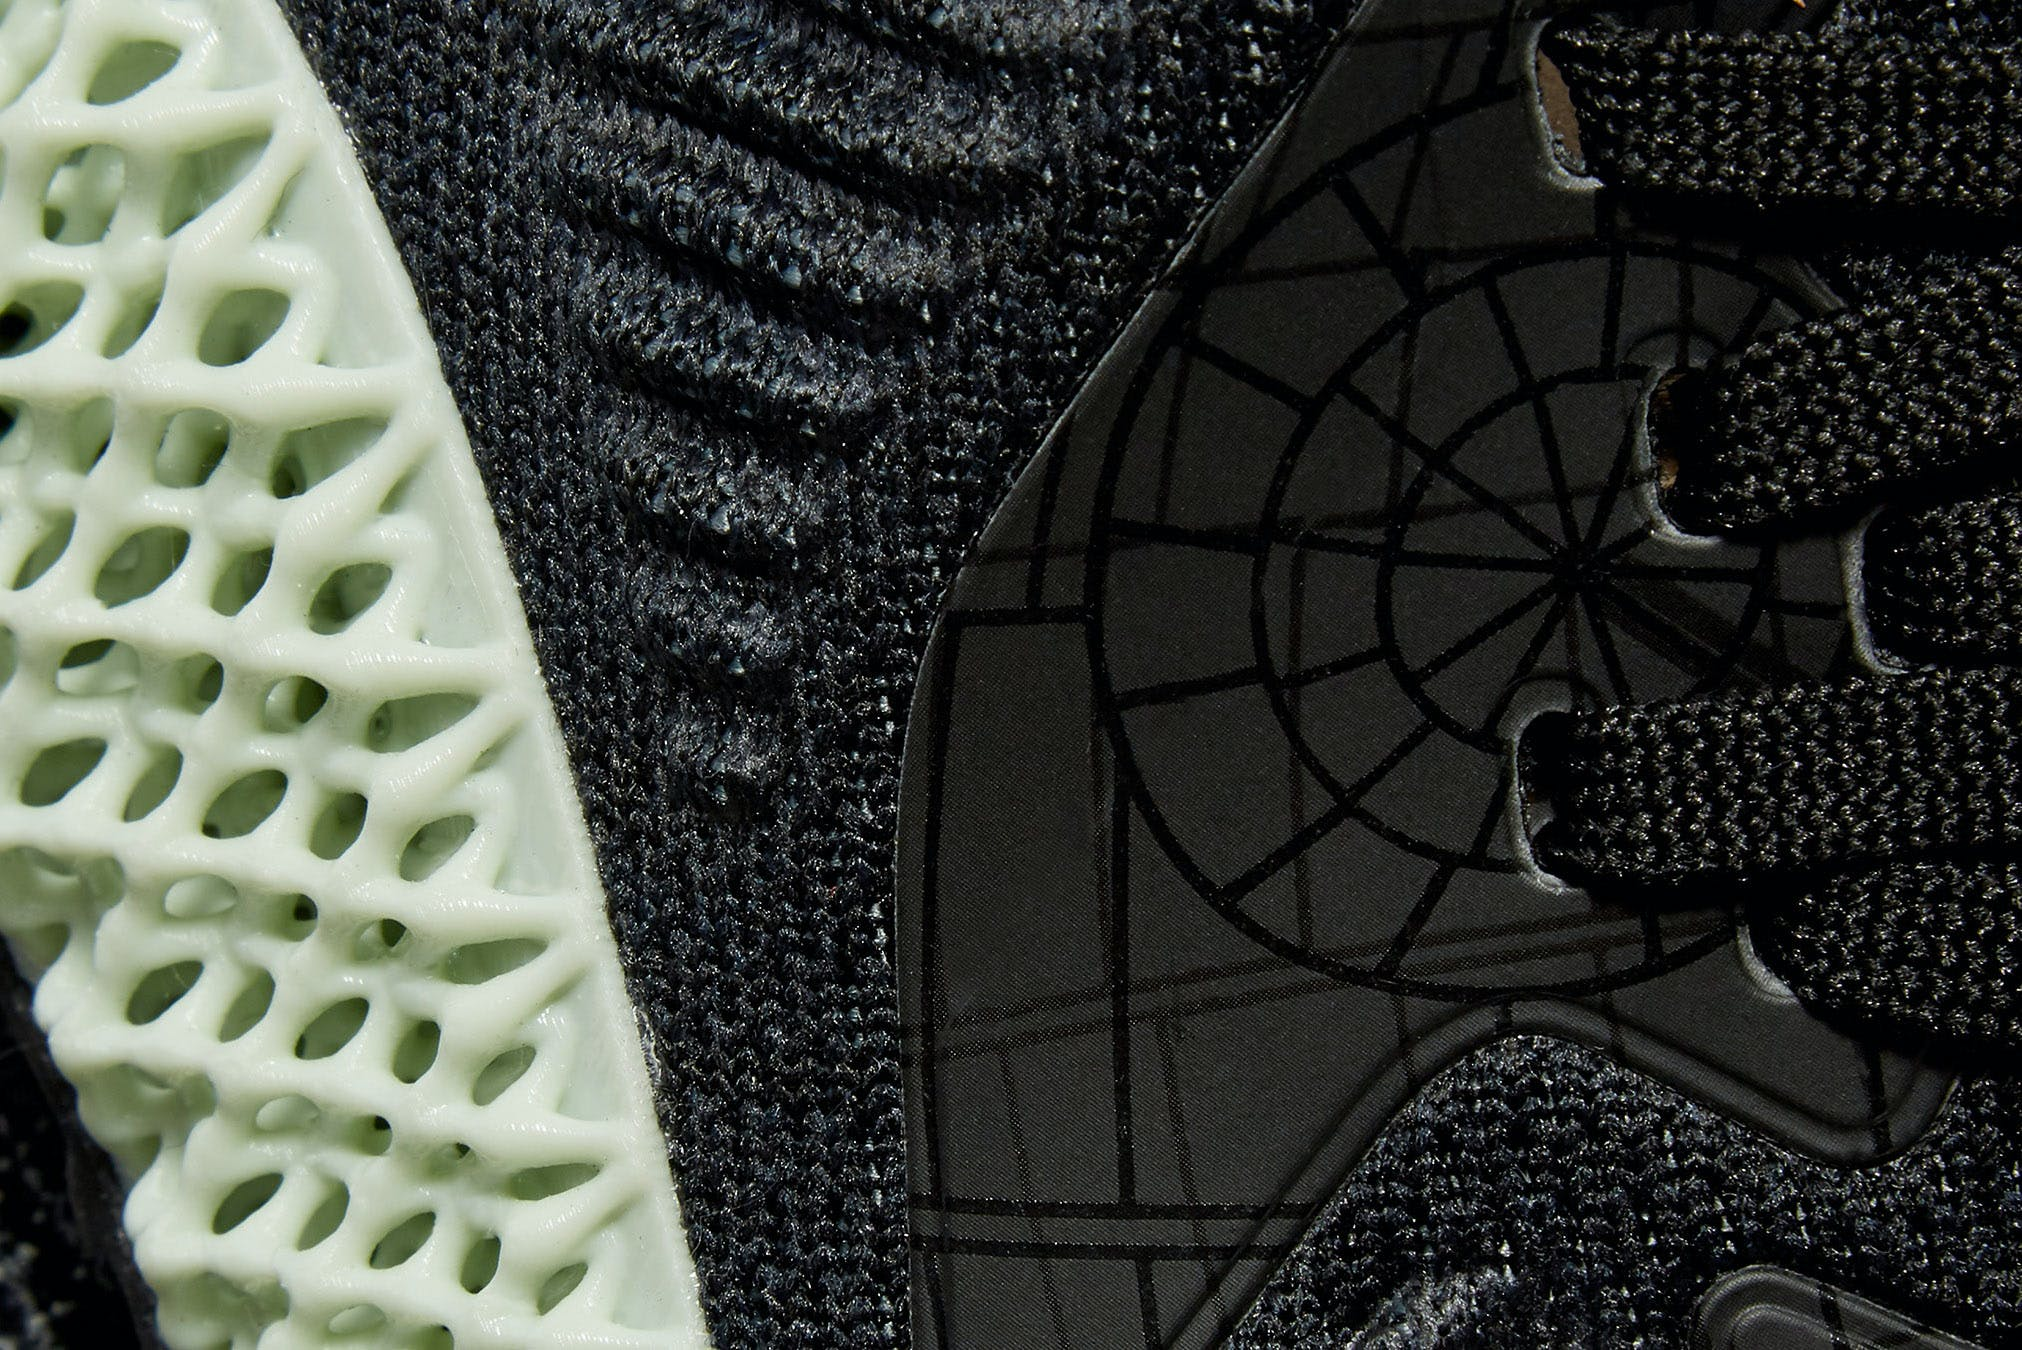 adidas Alphaedge x Star Wars 4D - FV4685